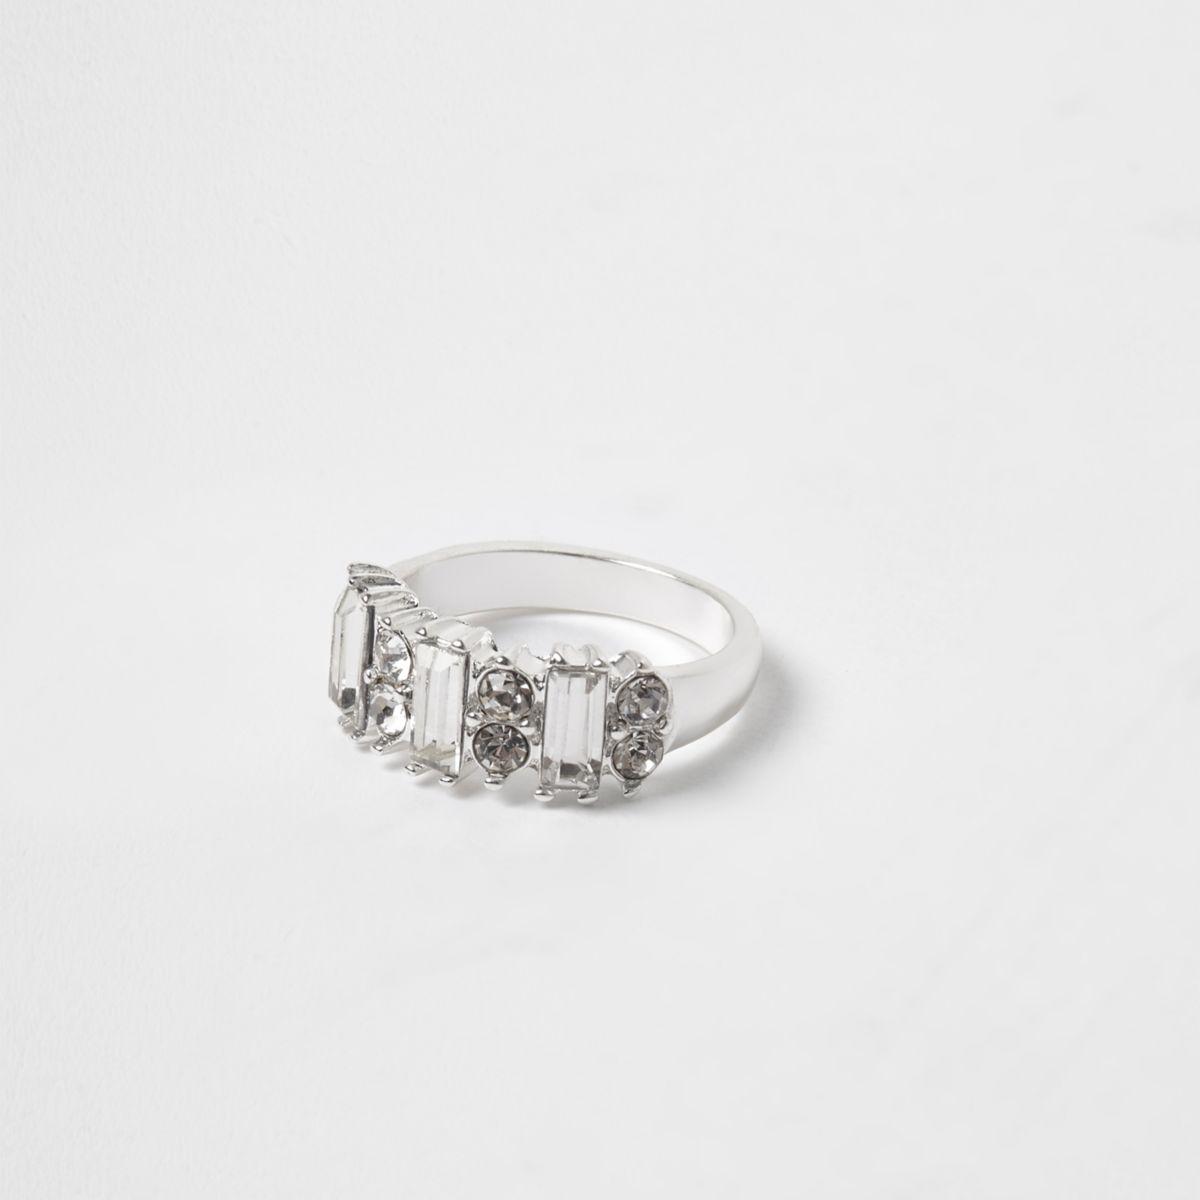 Silver tone baguette diamante ring